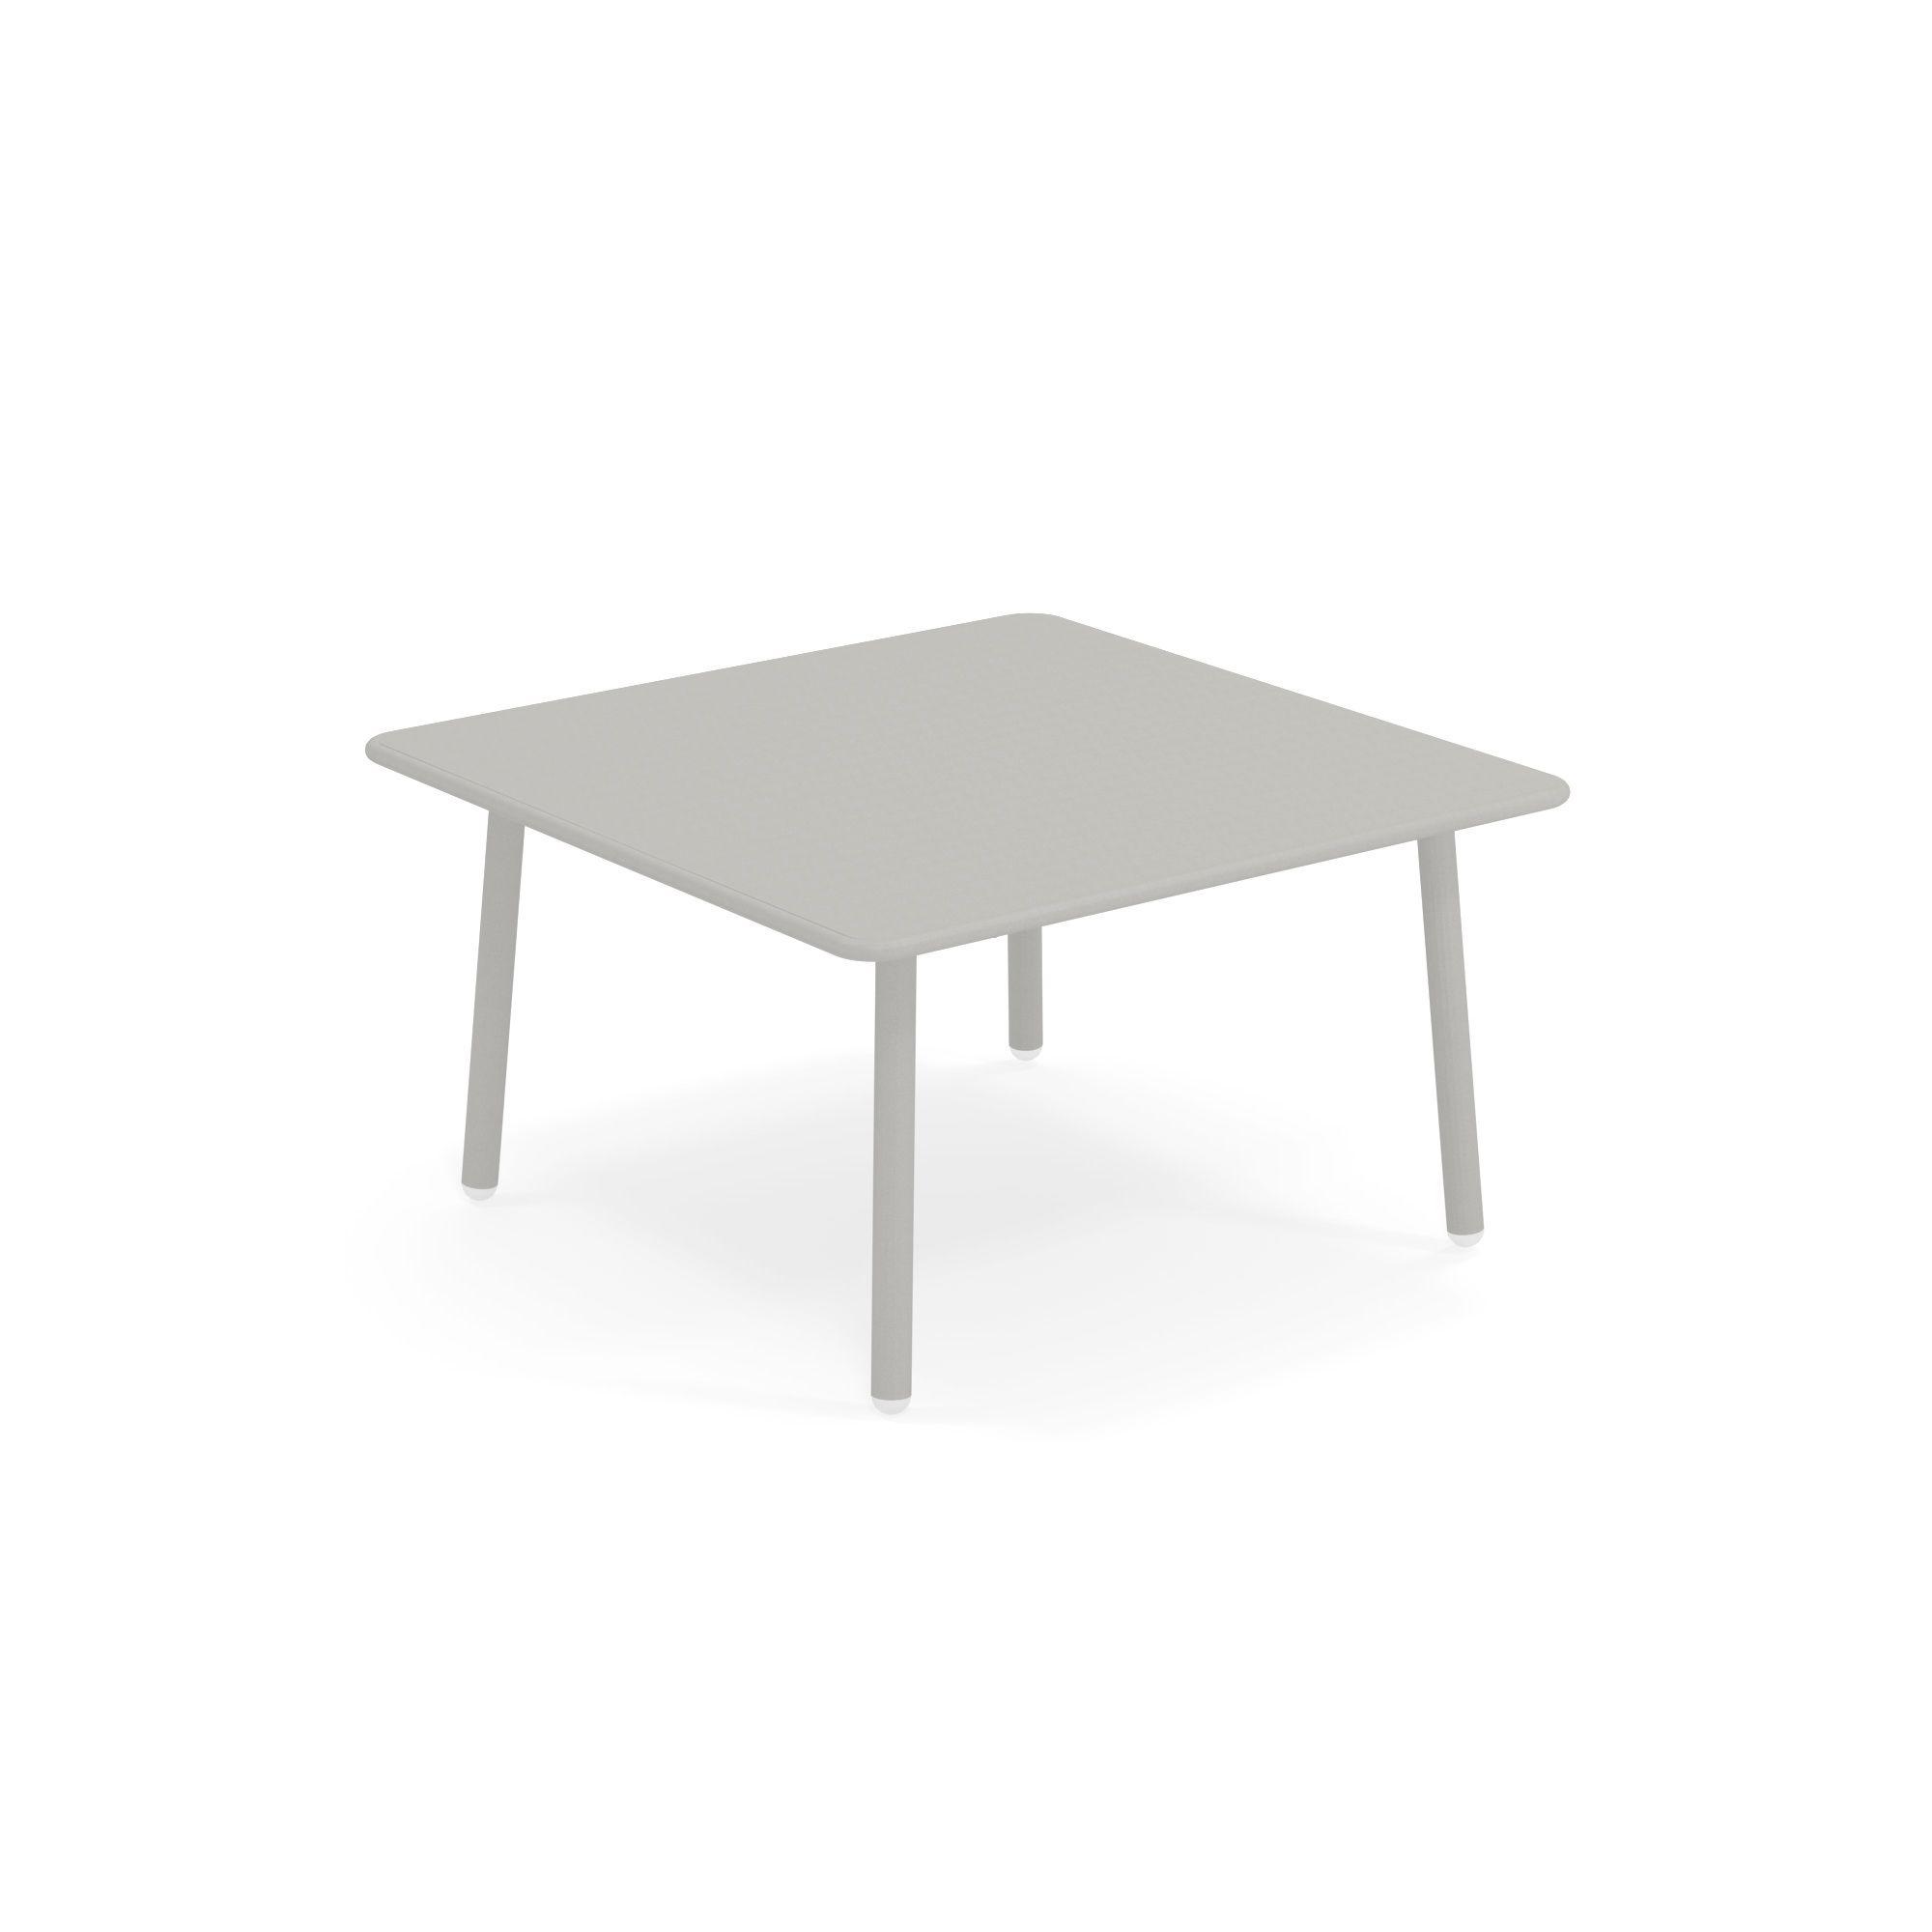 emuamericas, llc 526-73 low table, outdoor